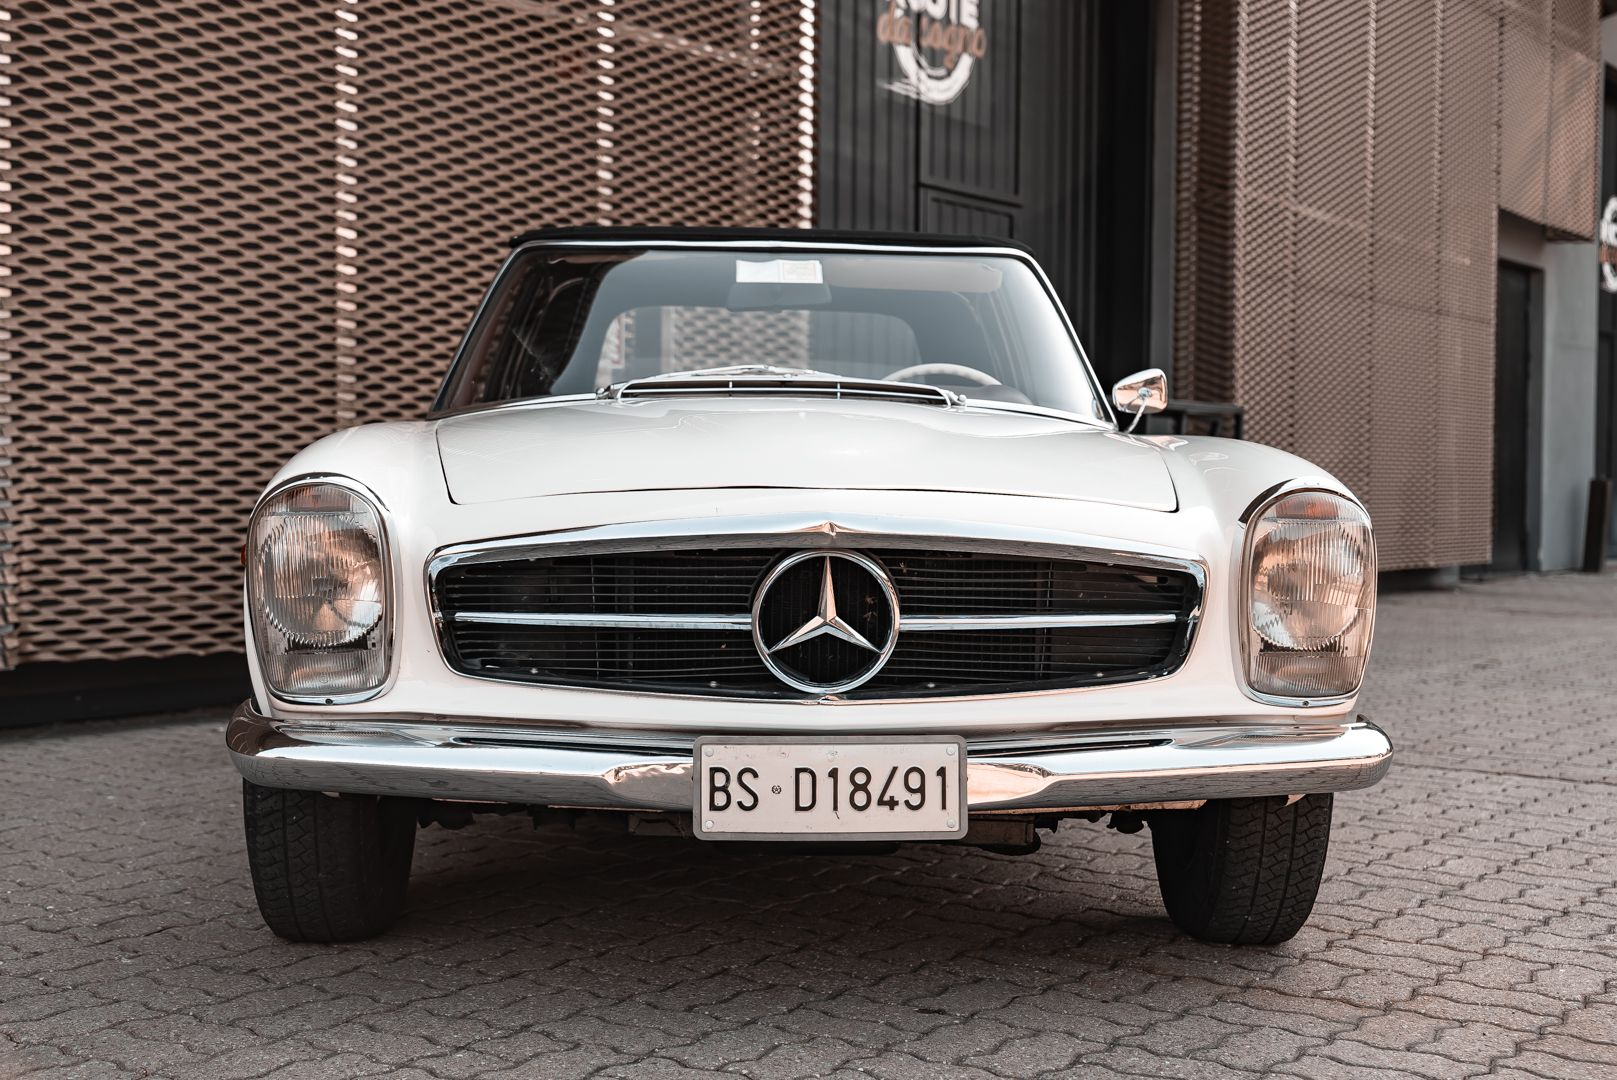 1965 Mercedes-Benz SL230 Pagoda 78516